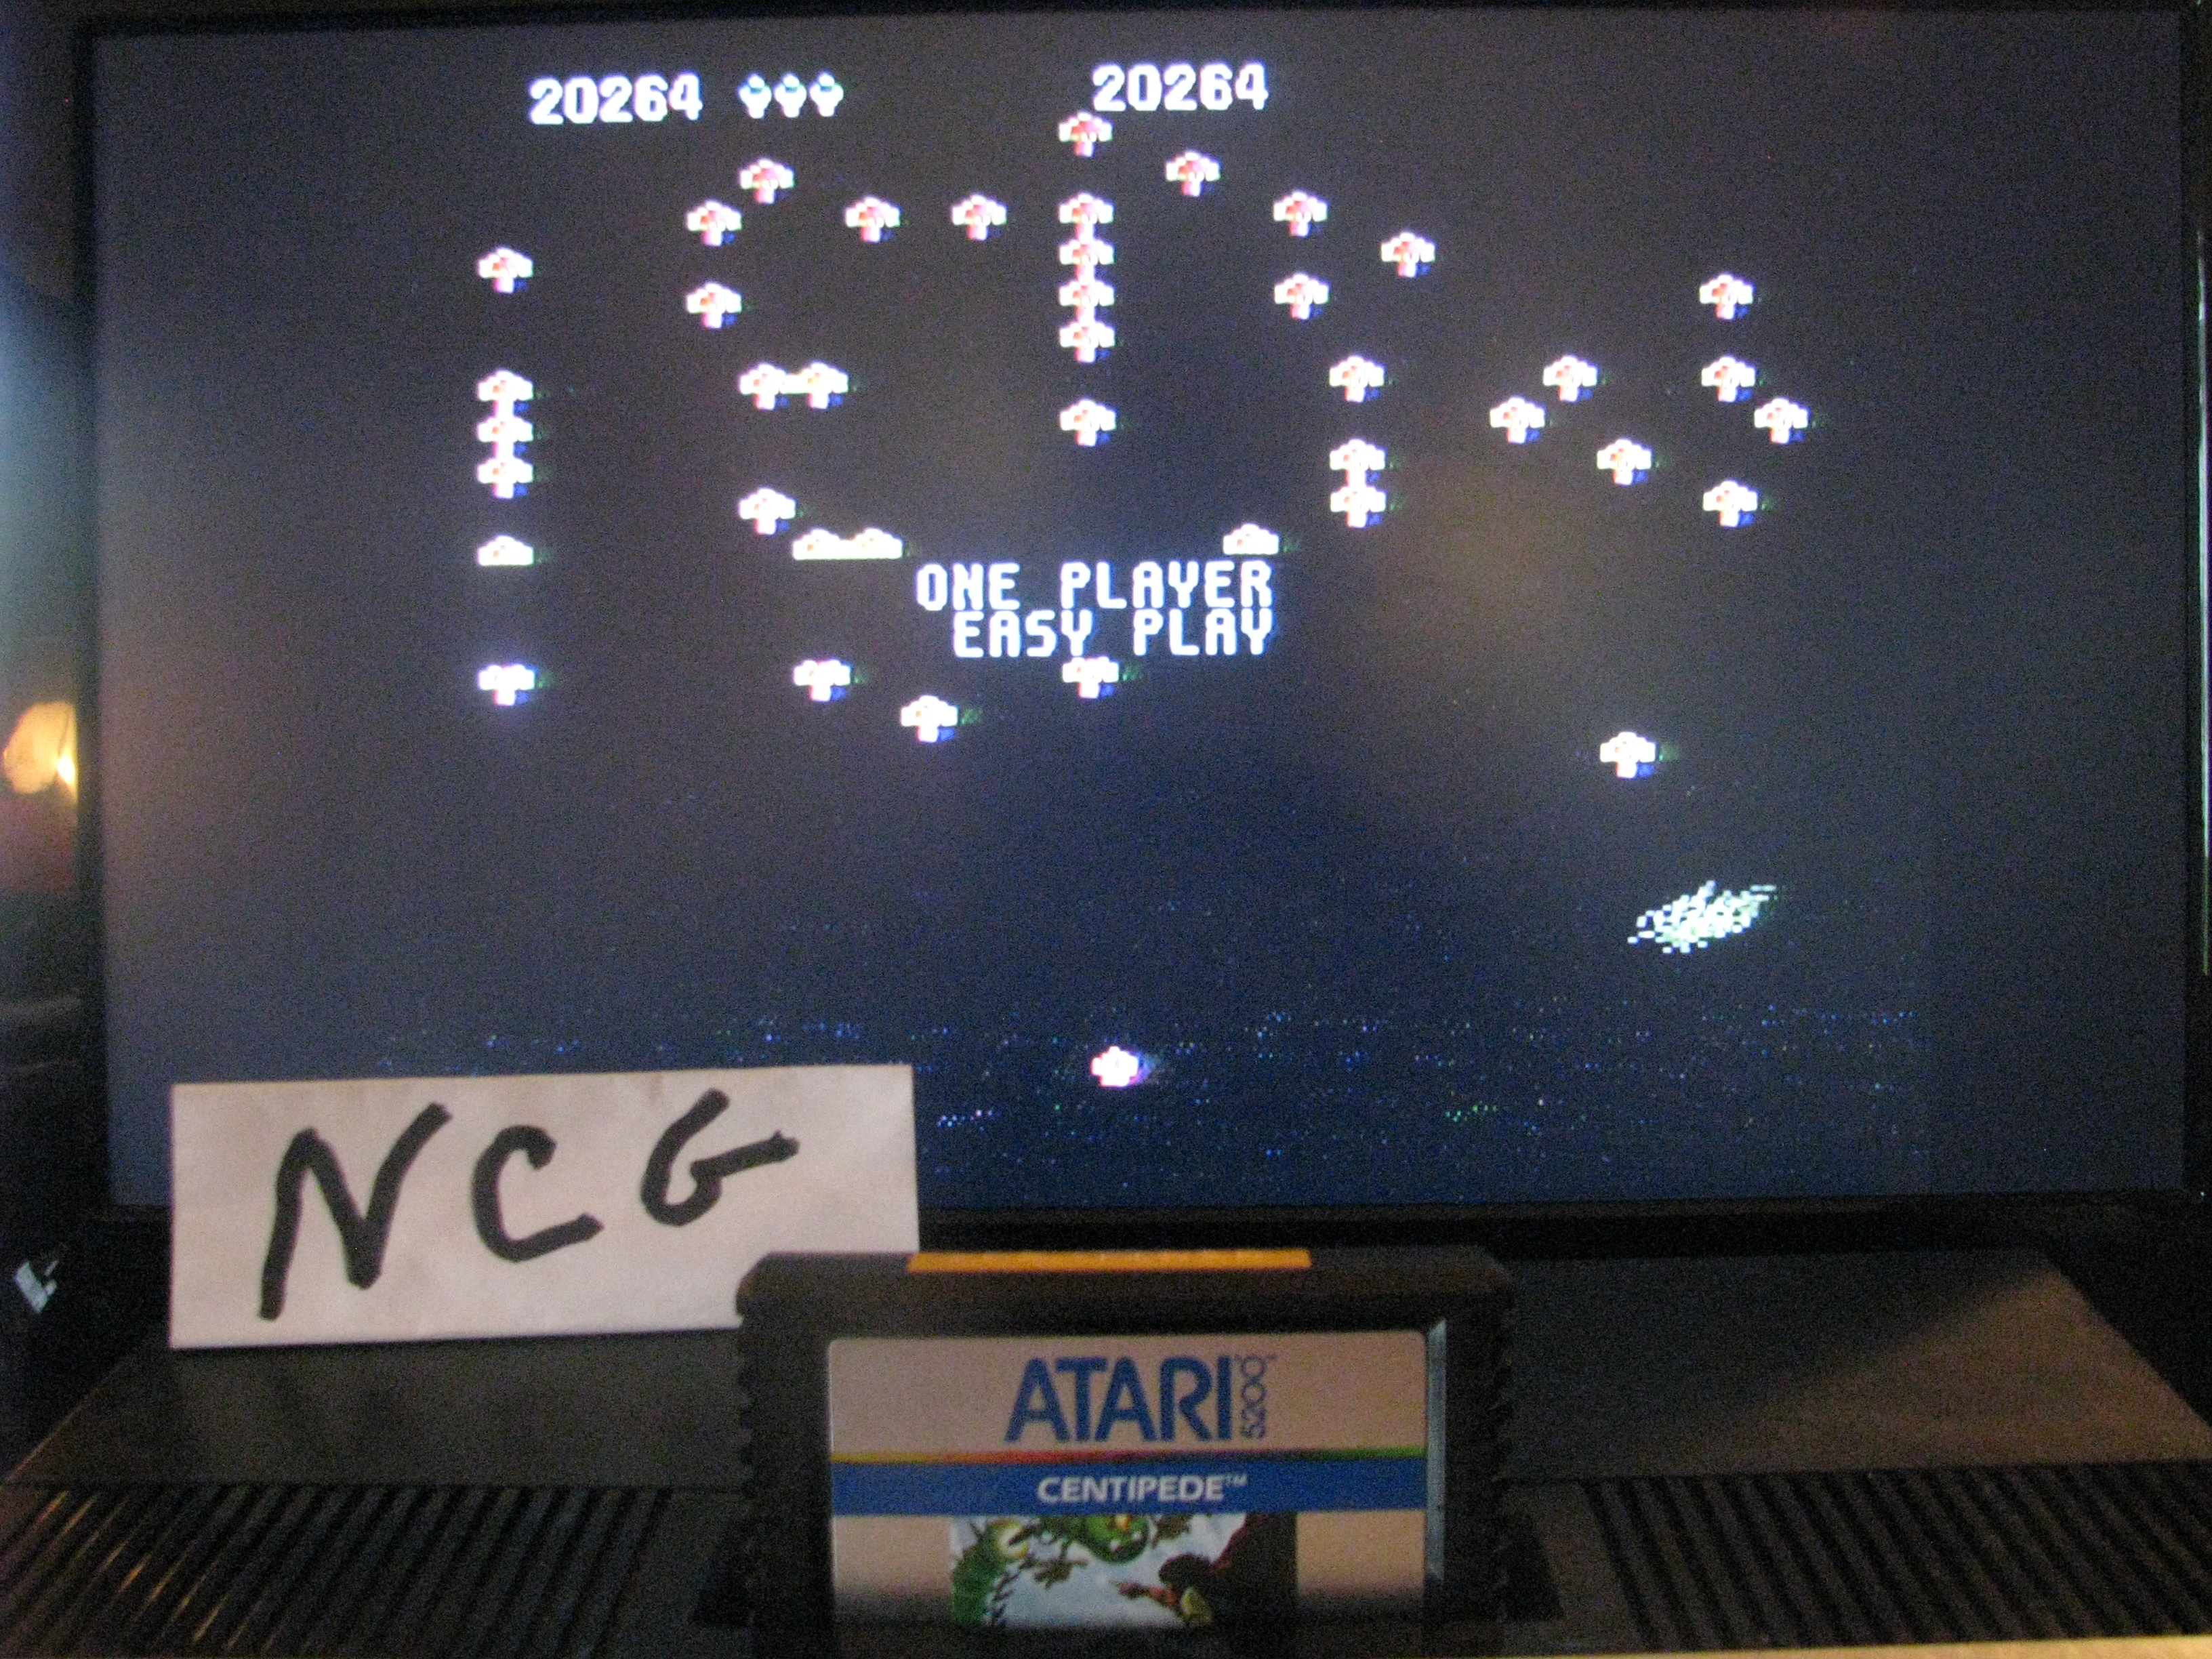 NorthCoastGamer: Centipede: Easy (Atari 5200) 20,264 points on 2014-10-23 20:03:43